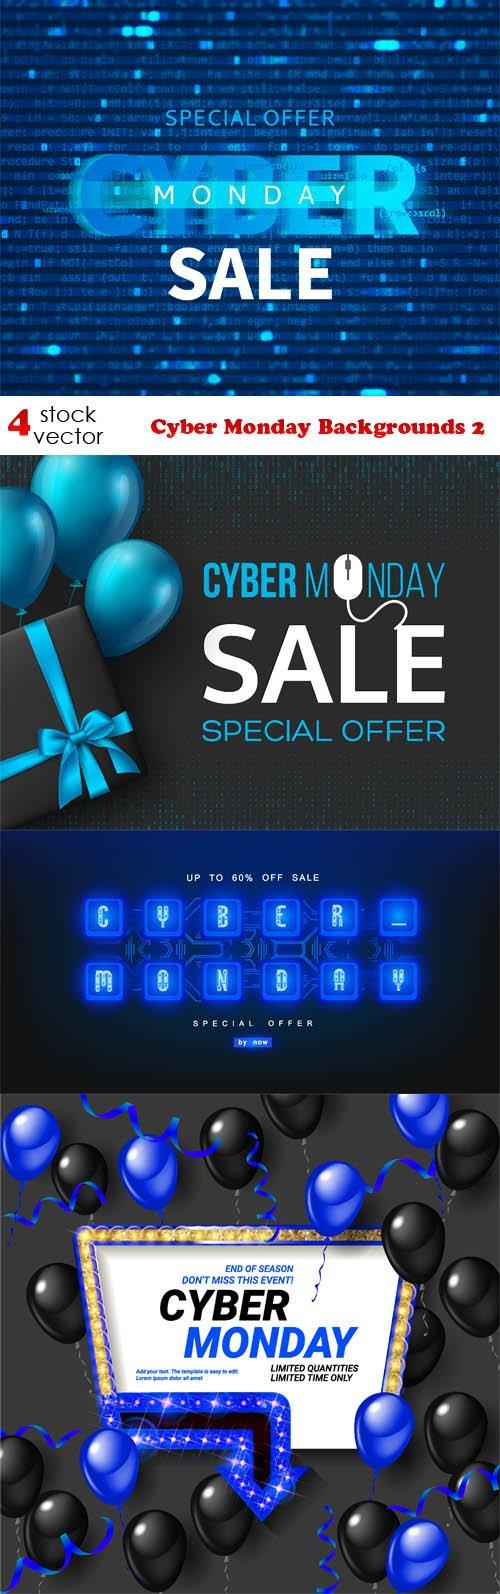 Vectors - Cyber Monday Backgrounds 2